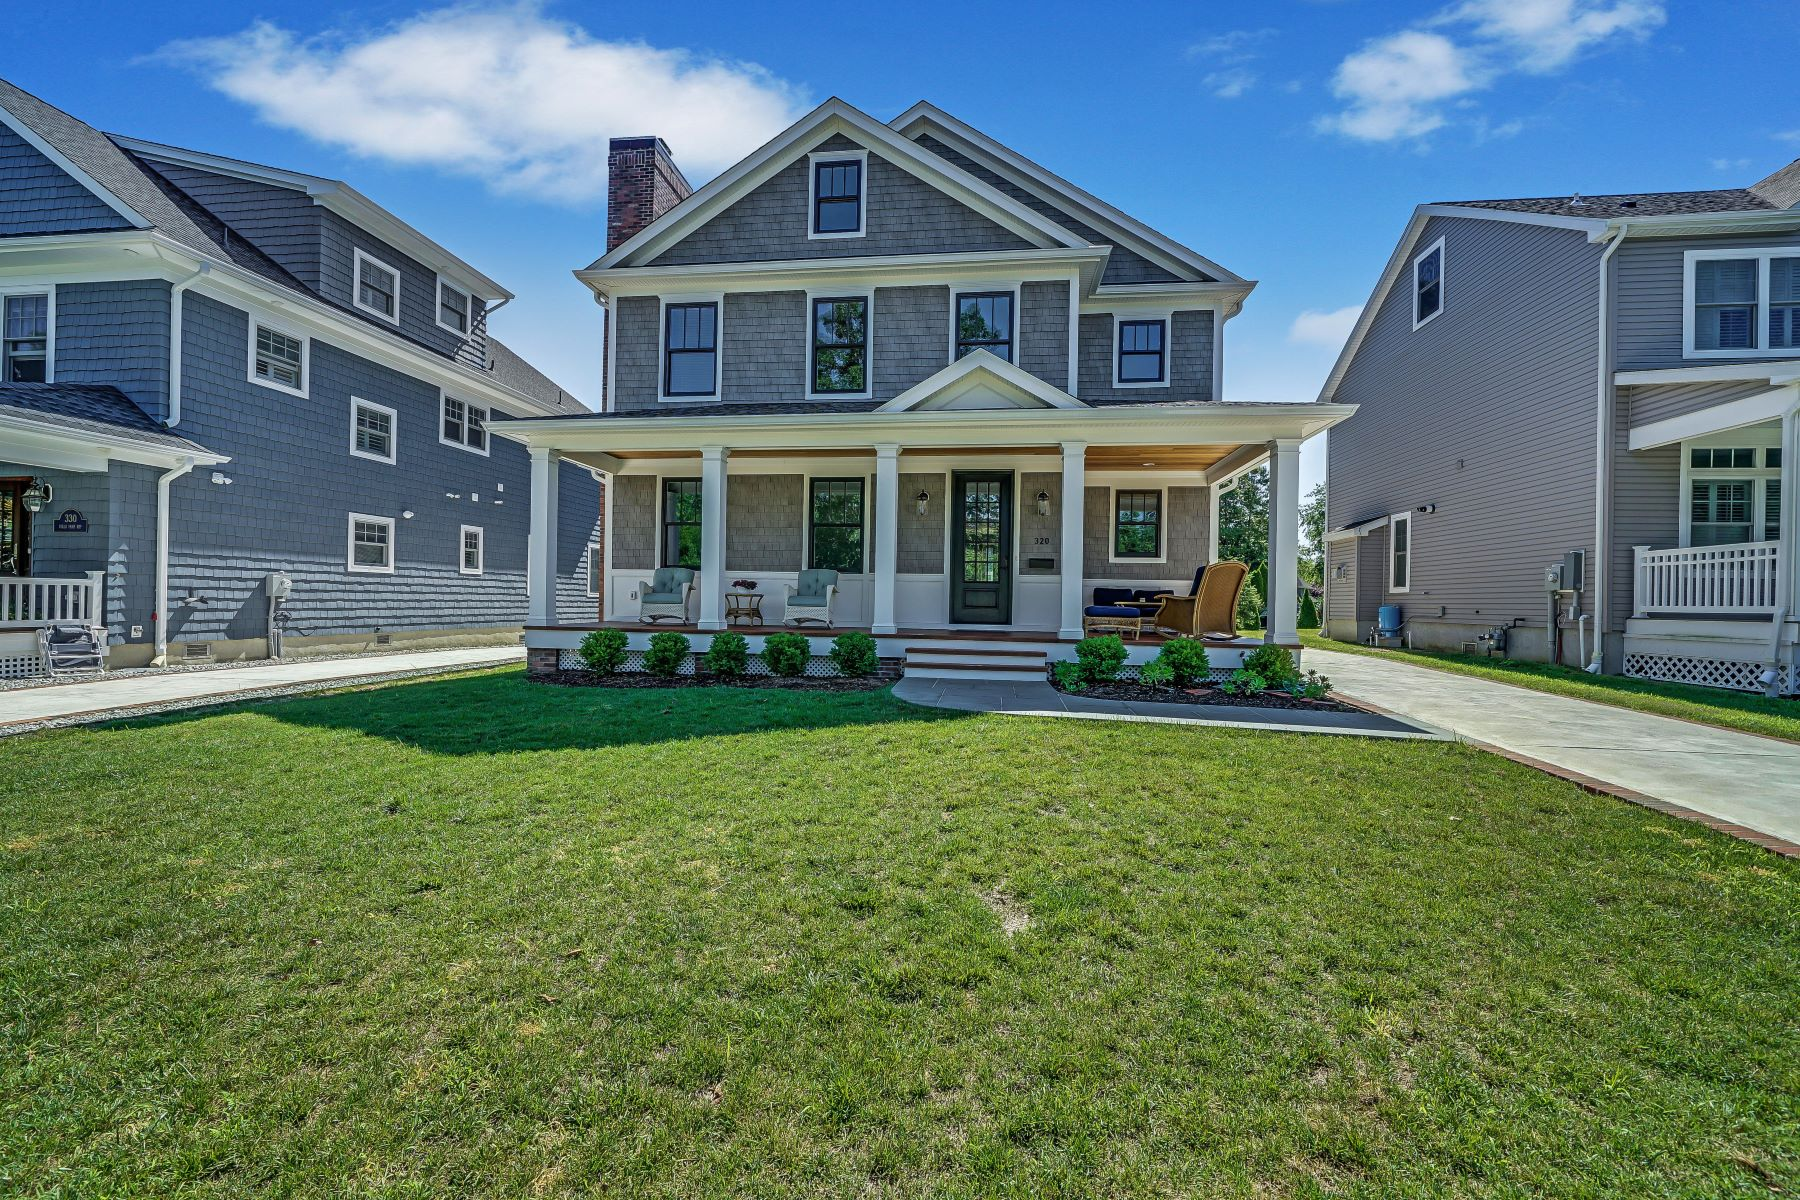 Property 为 出租 在 Summer in Spring Lake 320 Villa Park Way, 斯普林莱克, 新泽西州 07762 美国